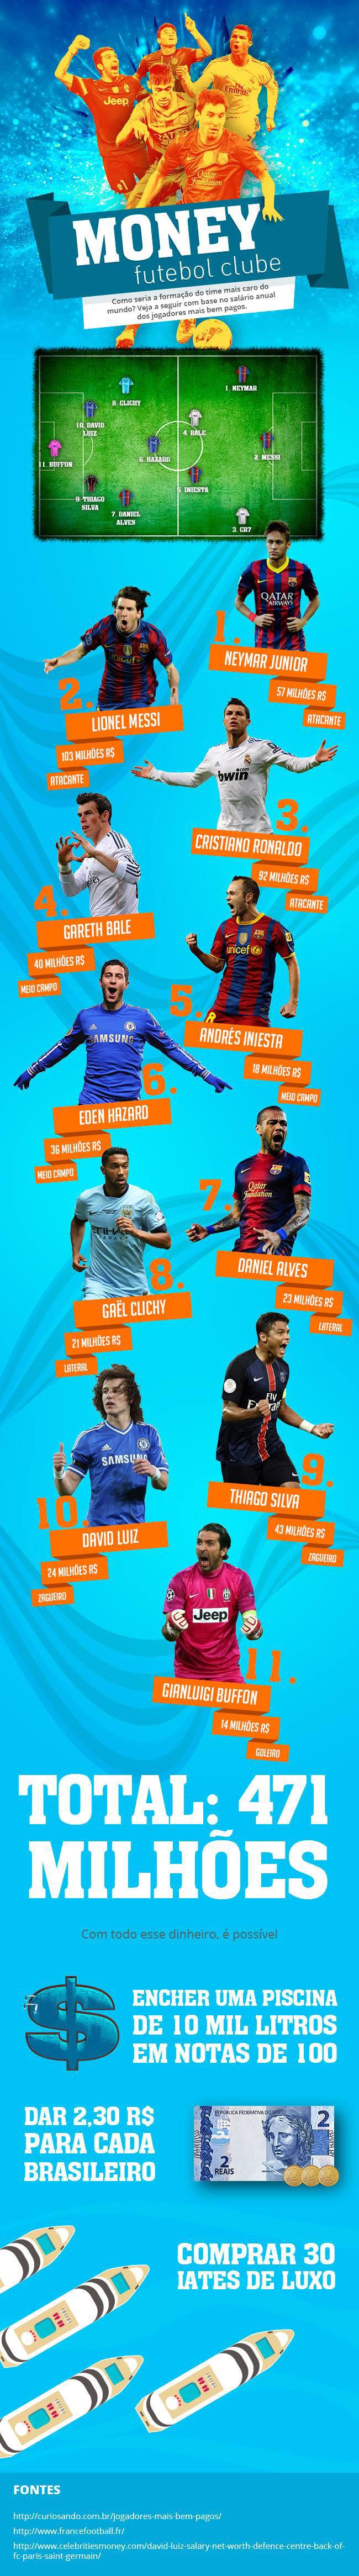 money-futebol-clube